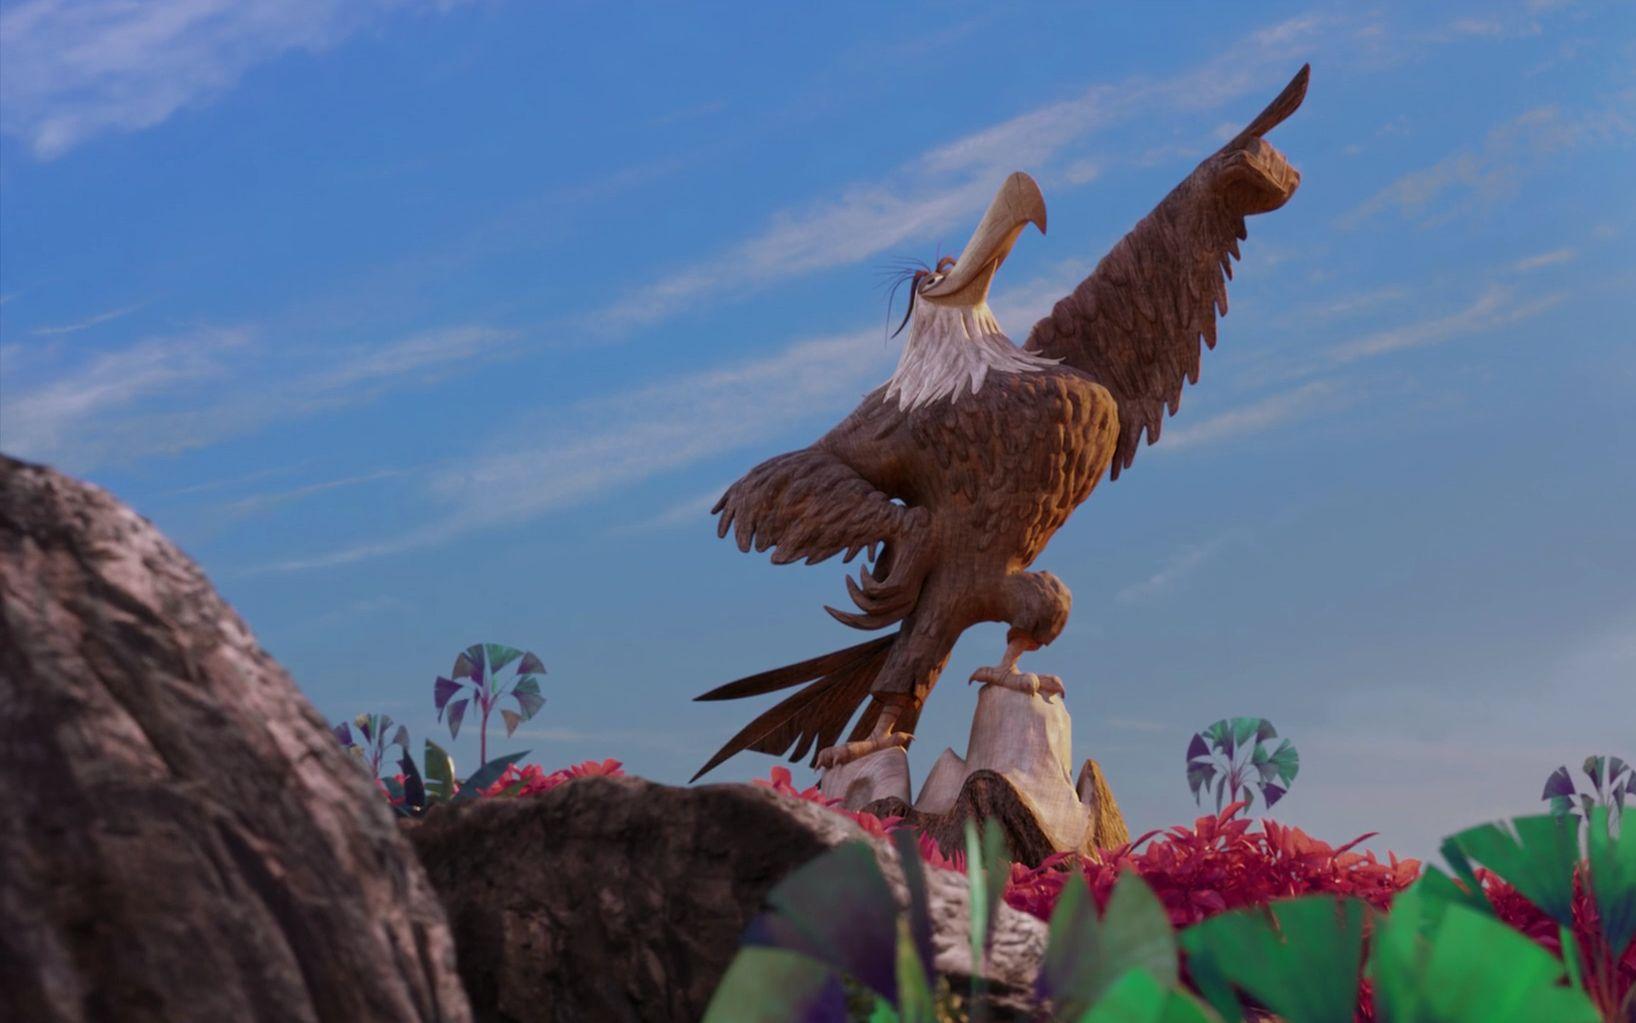 1080p南小鸟_bd1080p(中英原盘字幕) 用或其他应用扫描二维码 点赞 《愤怒的小鸟》